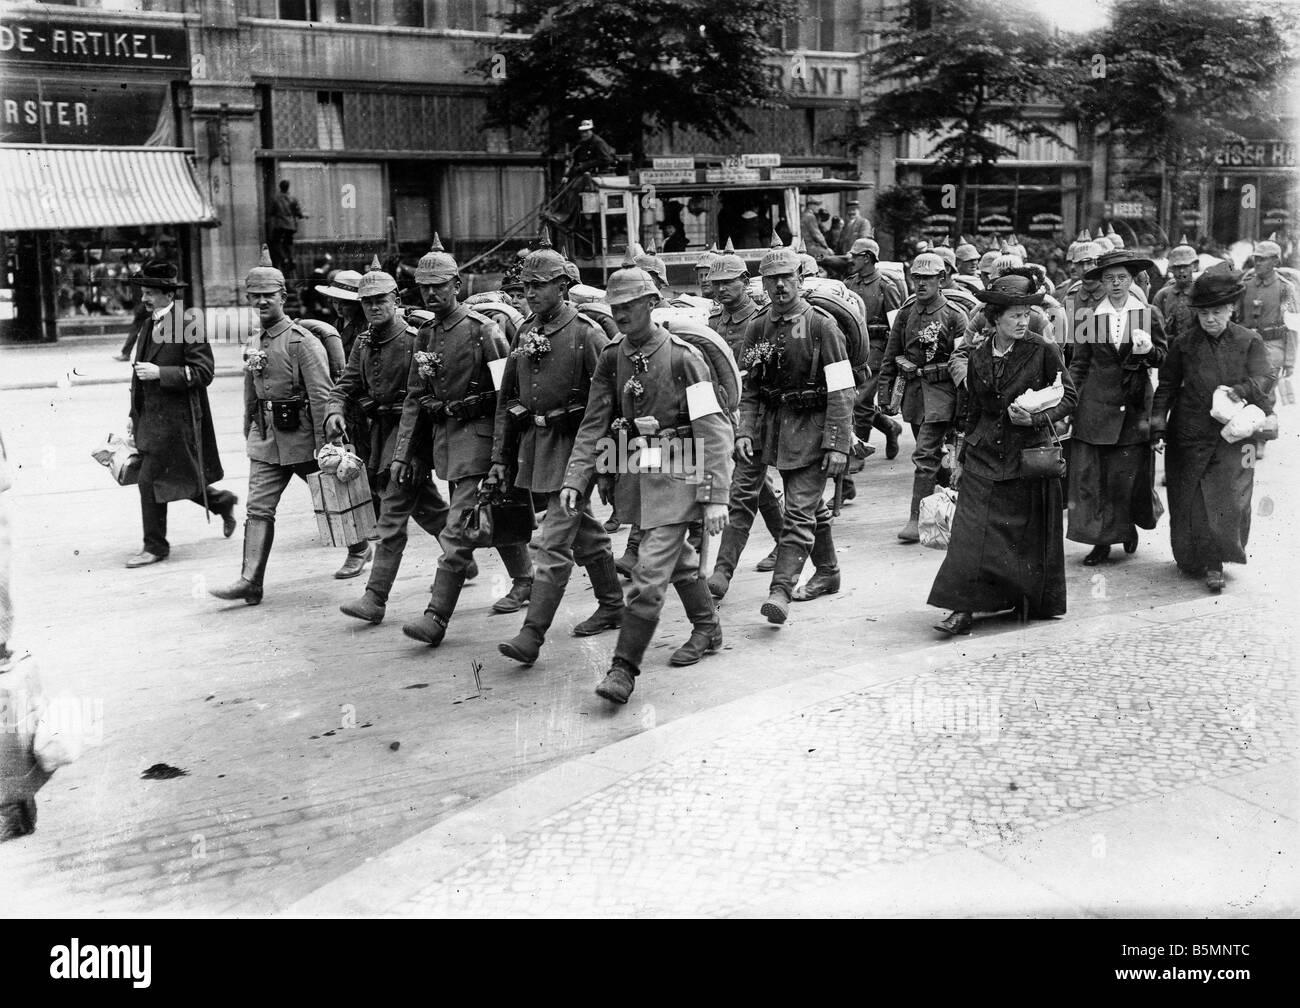 Pagina 1 di 37. 8 1914 0 0 A1 soldati con famiglie Berlino 1914 I Guerra  Mondiale 1914 1918 soldati 5a1d6342ca88